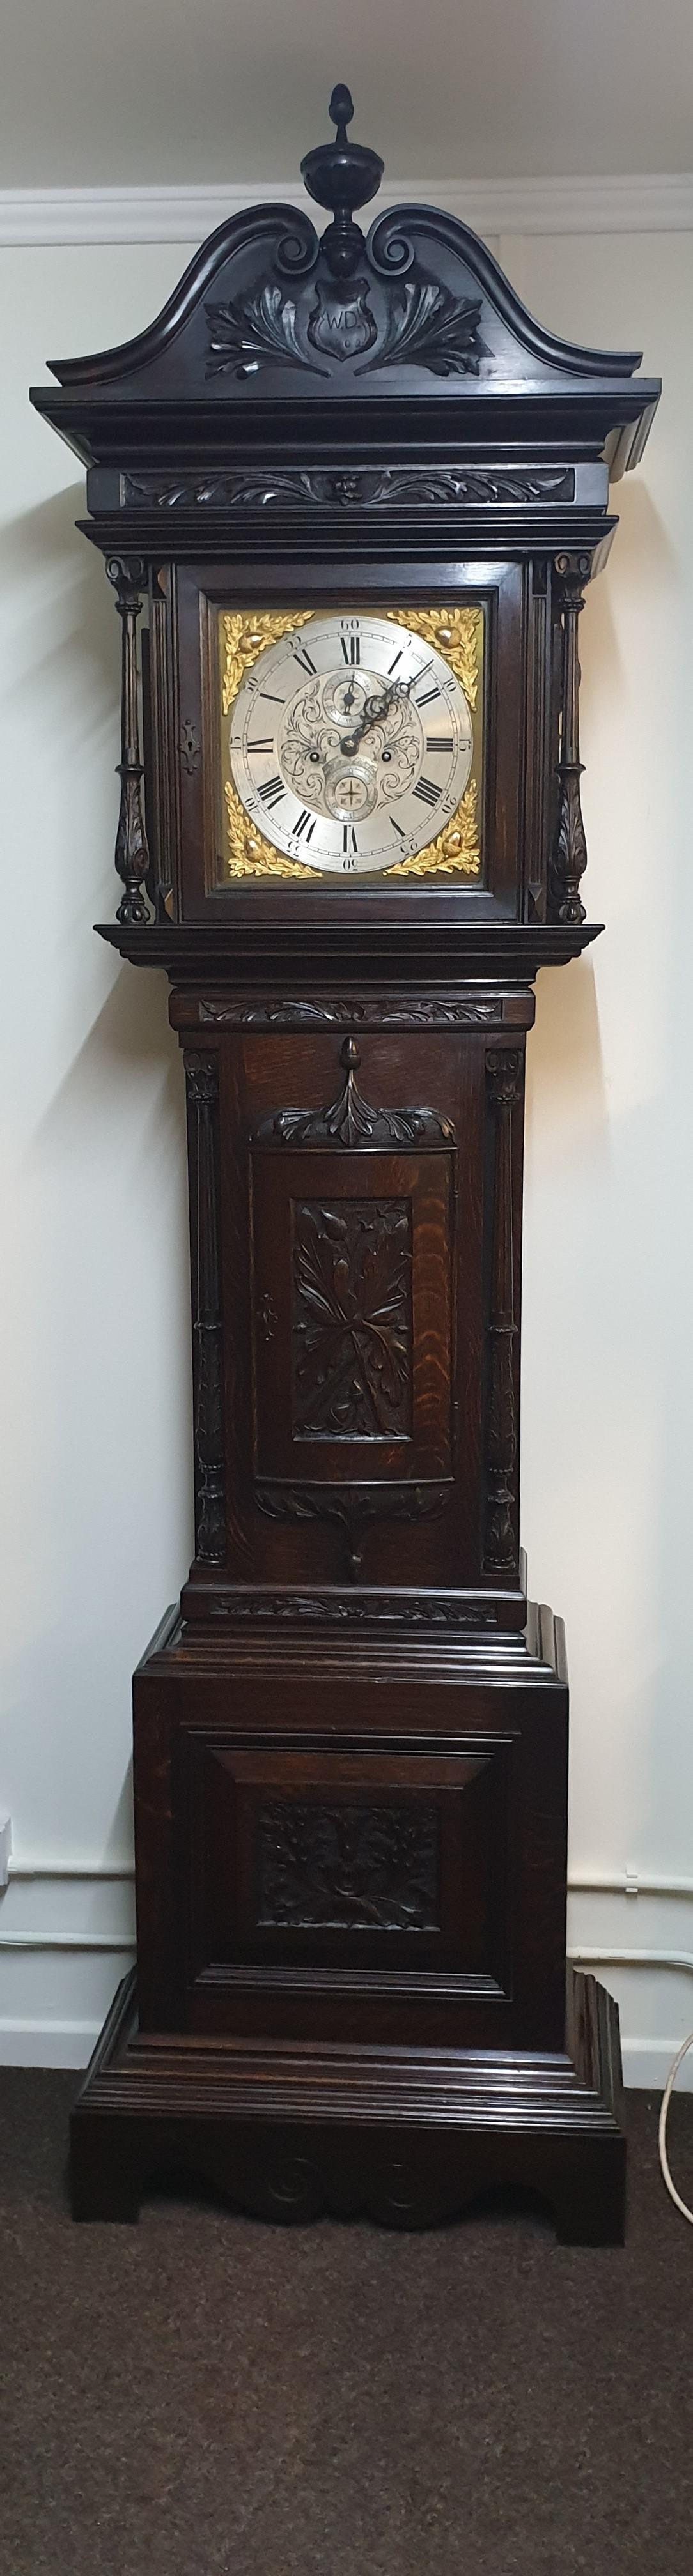 Outstanding Oak Grandfather Clock - William Evans (1 of 1)